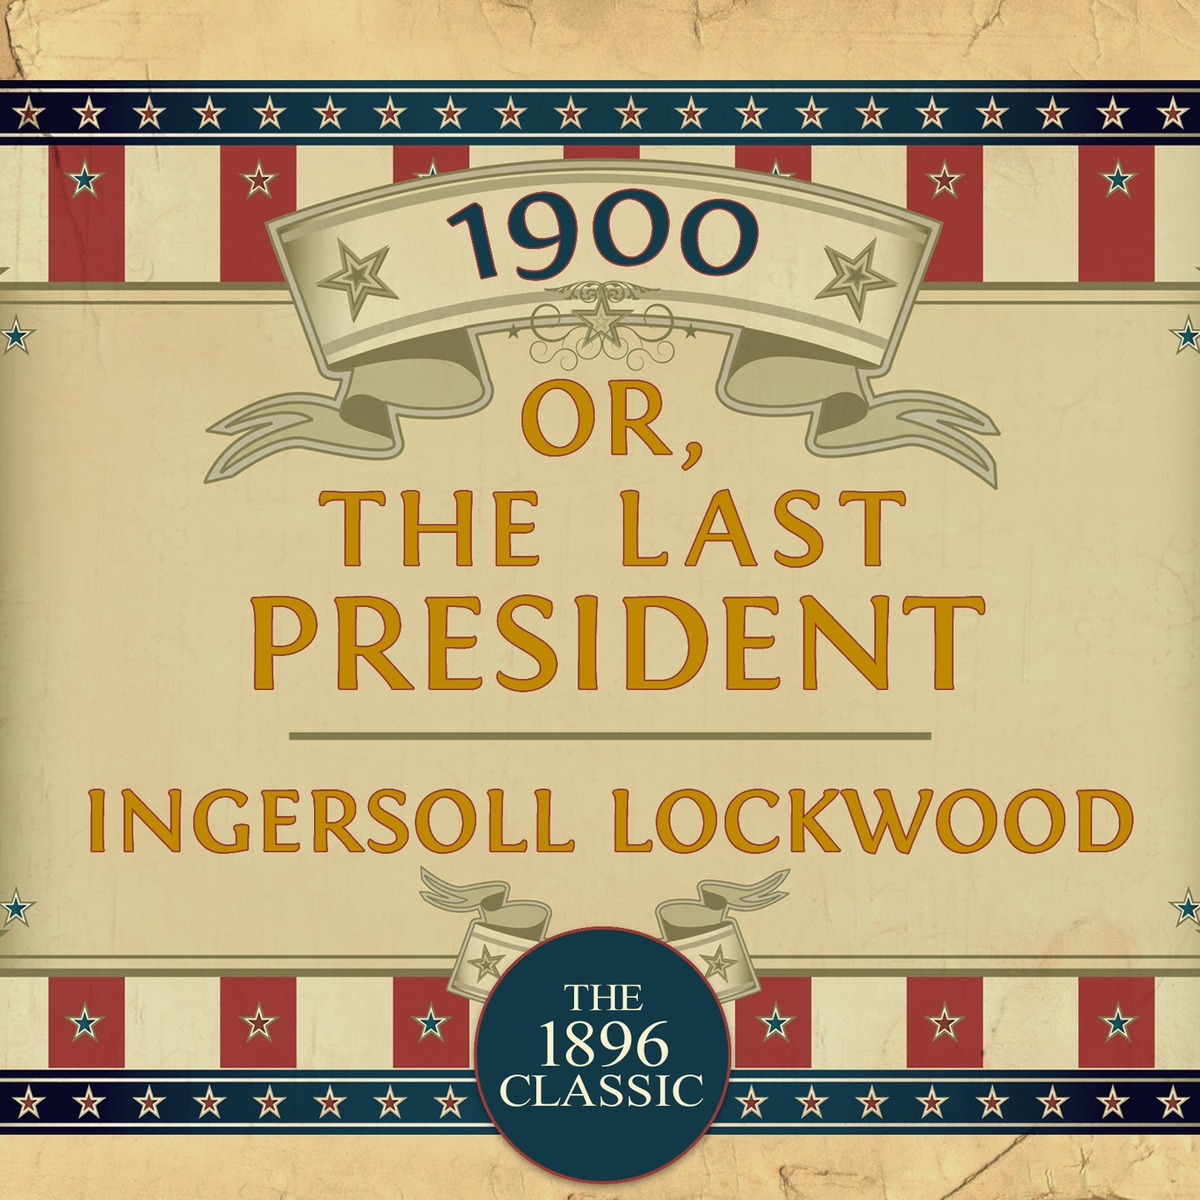 1900 [ The Last President ] ( story ) ... Ingersoll Lockwood